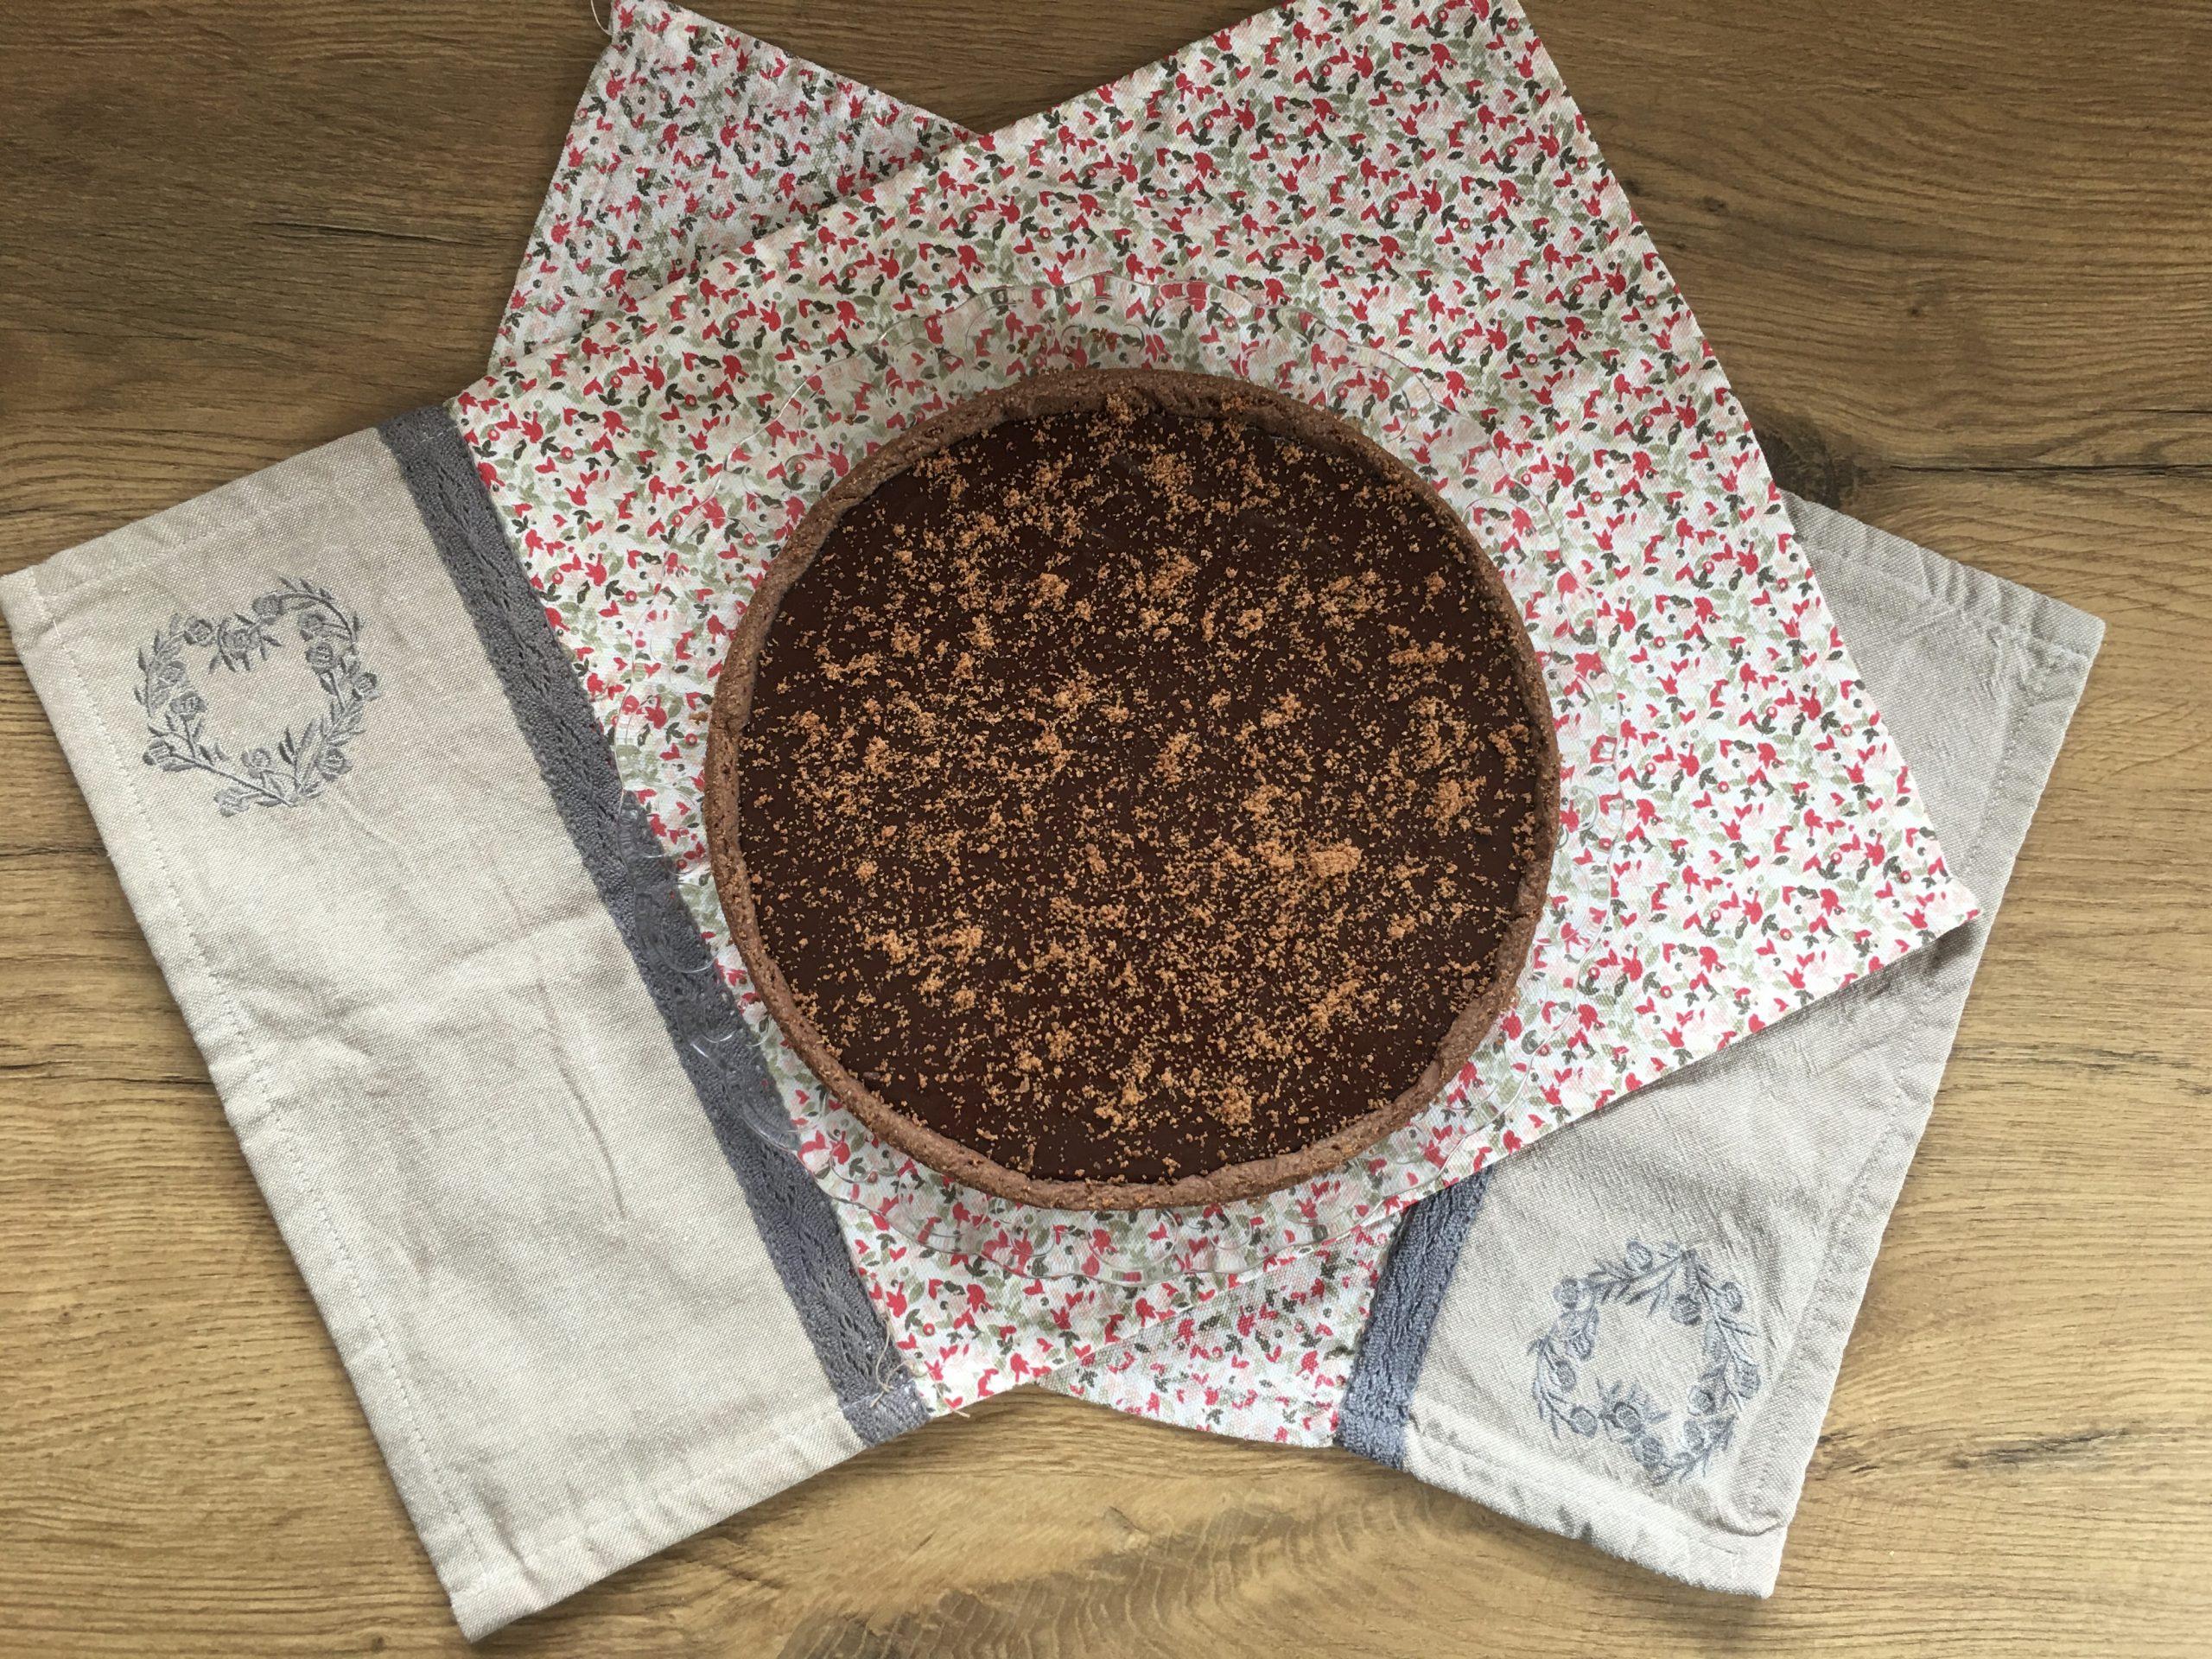 La tarte chocolat-praliné